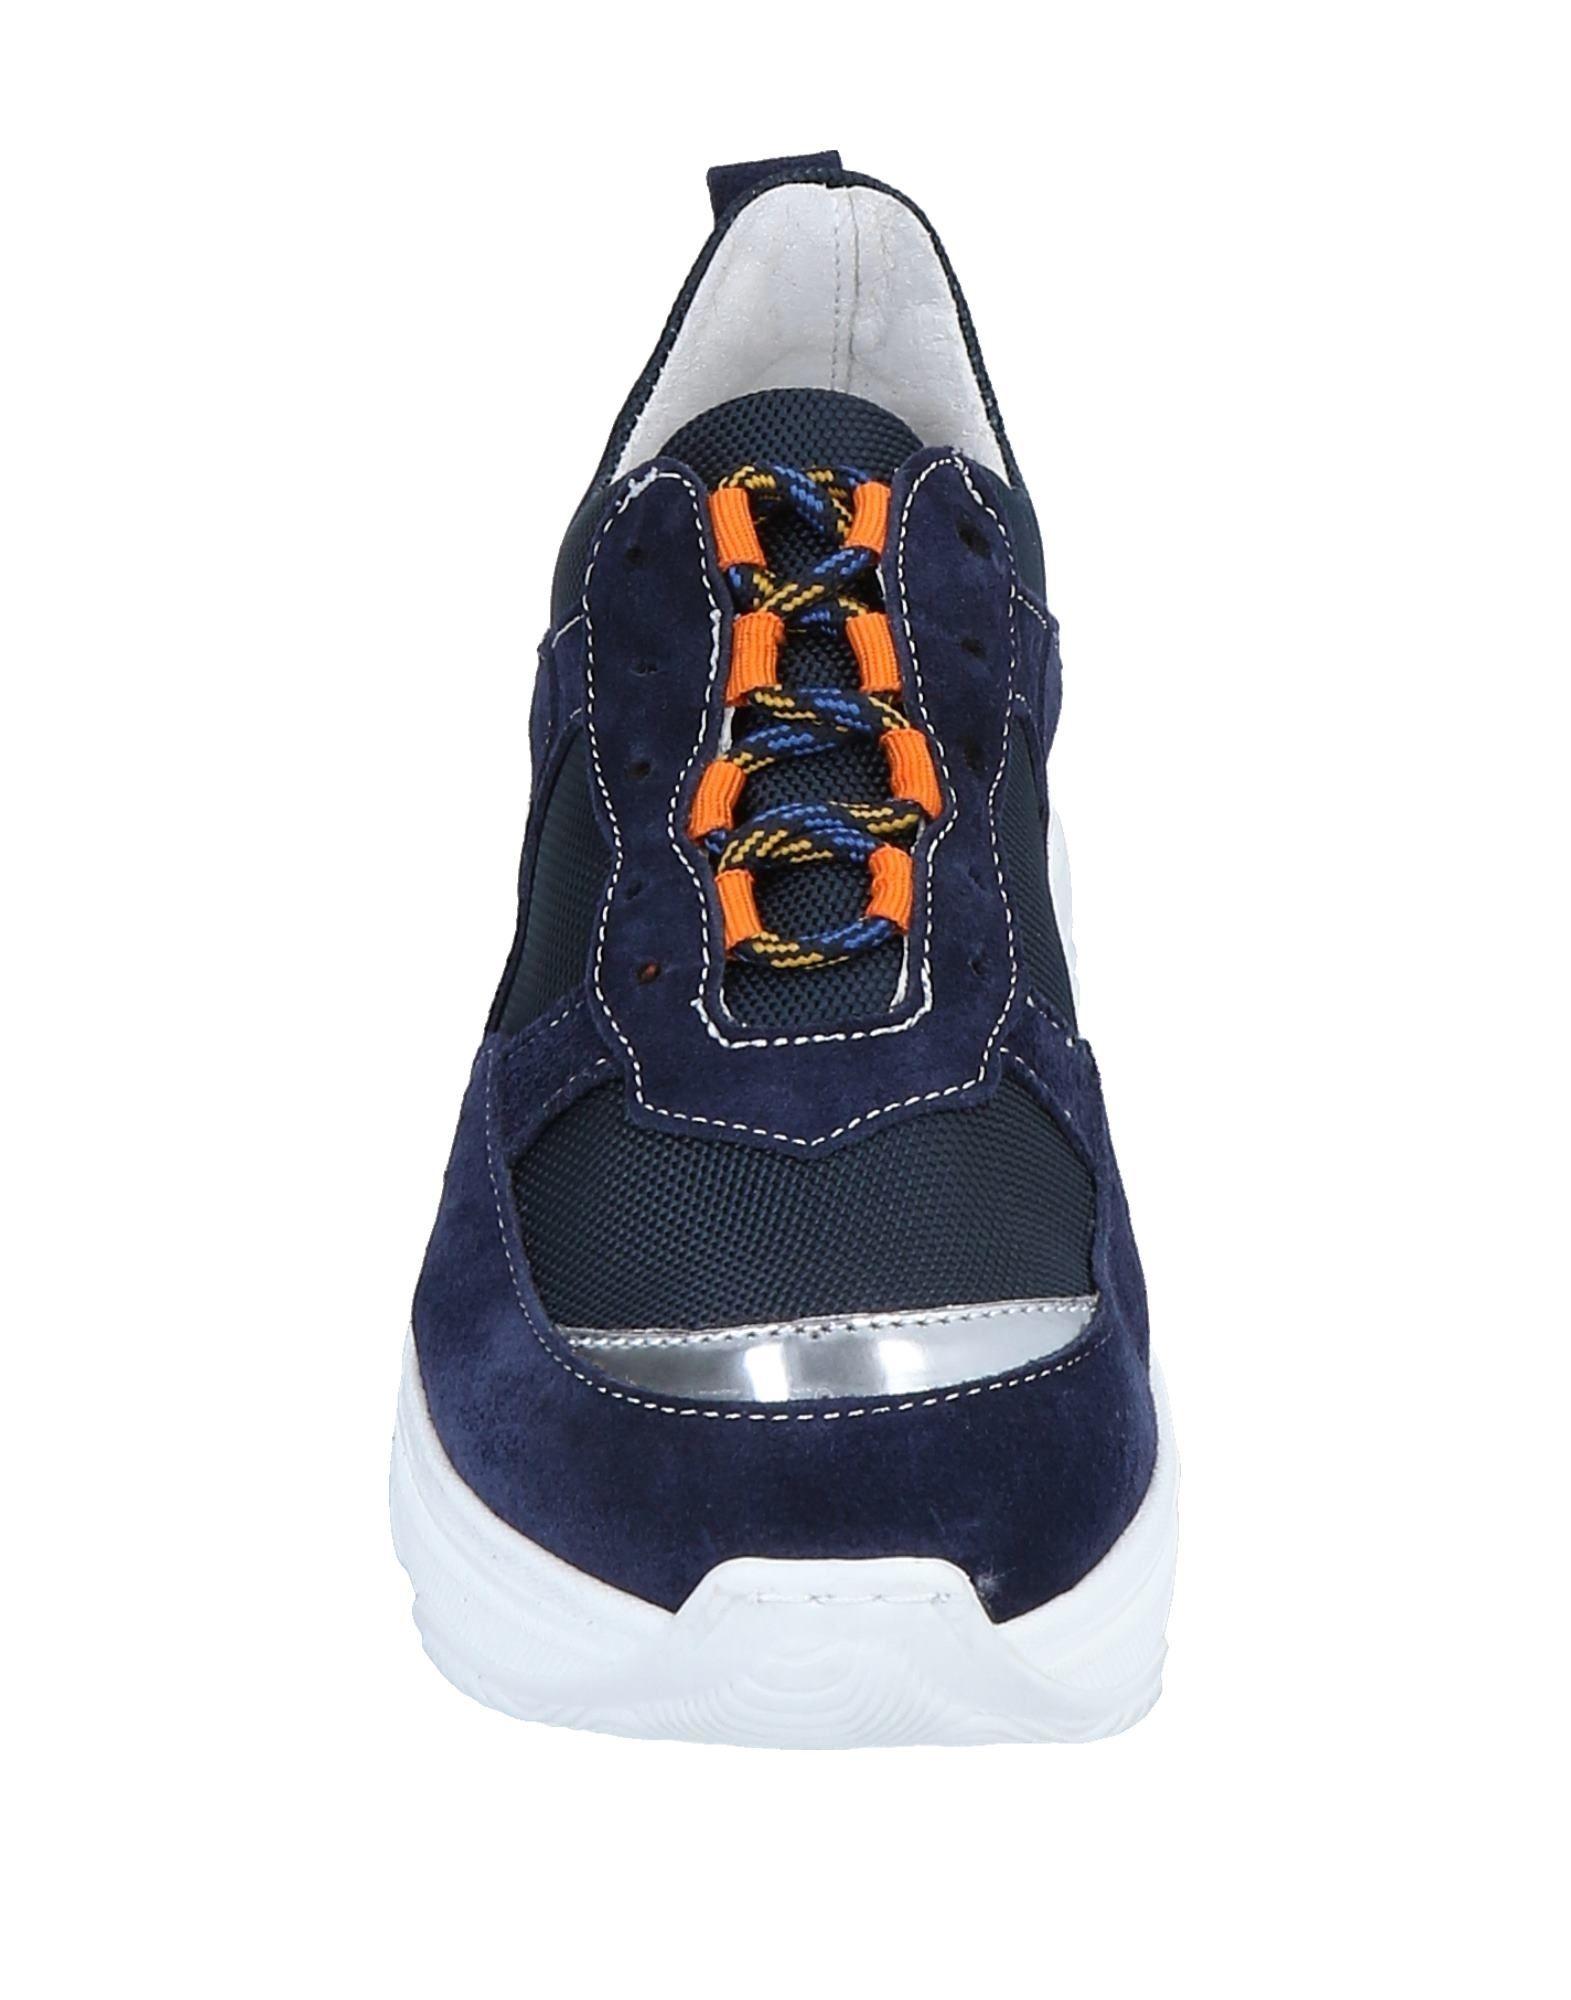 Divine Follie Sneakers Damen  11564271UG 11564271UG 11564271UG Gute Qualität beliebte Schuhe 0a458c